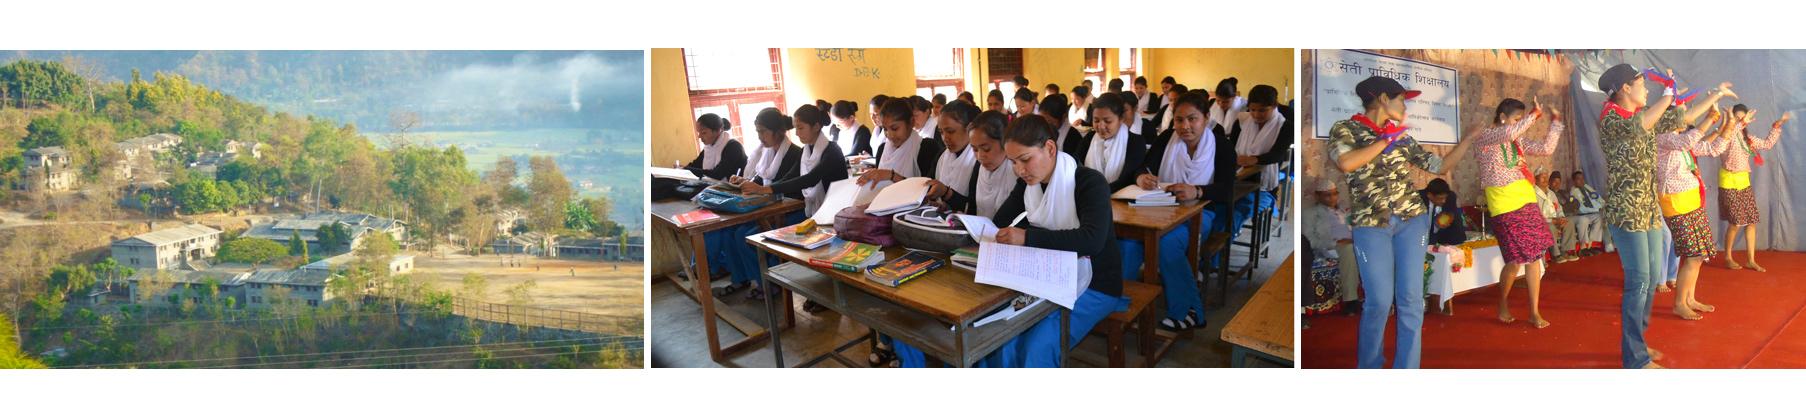 Seti Technical School